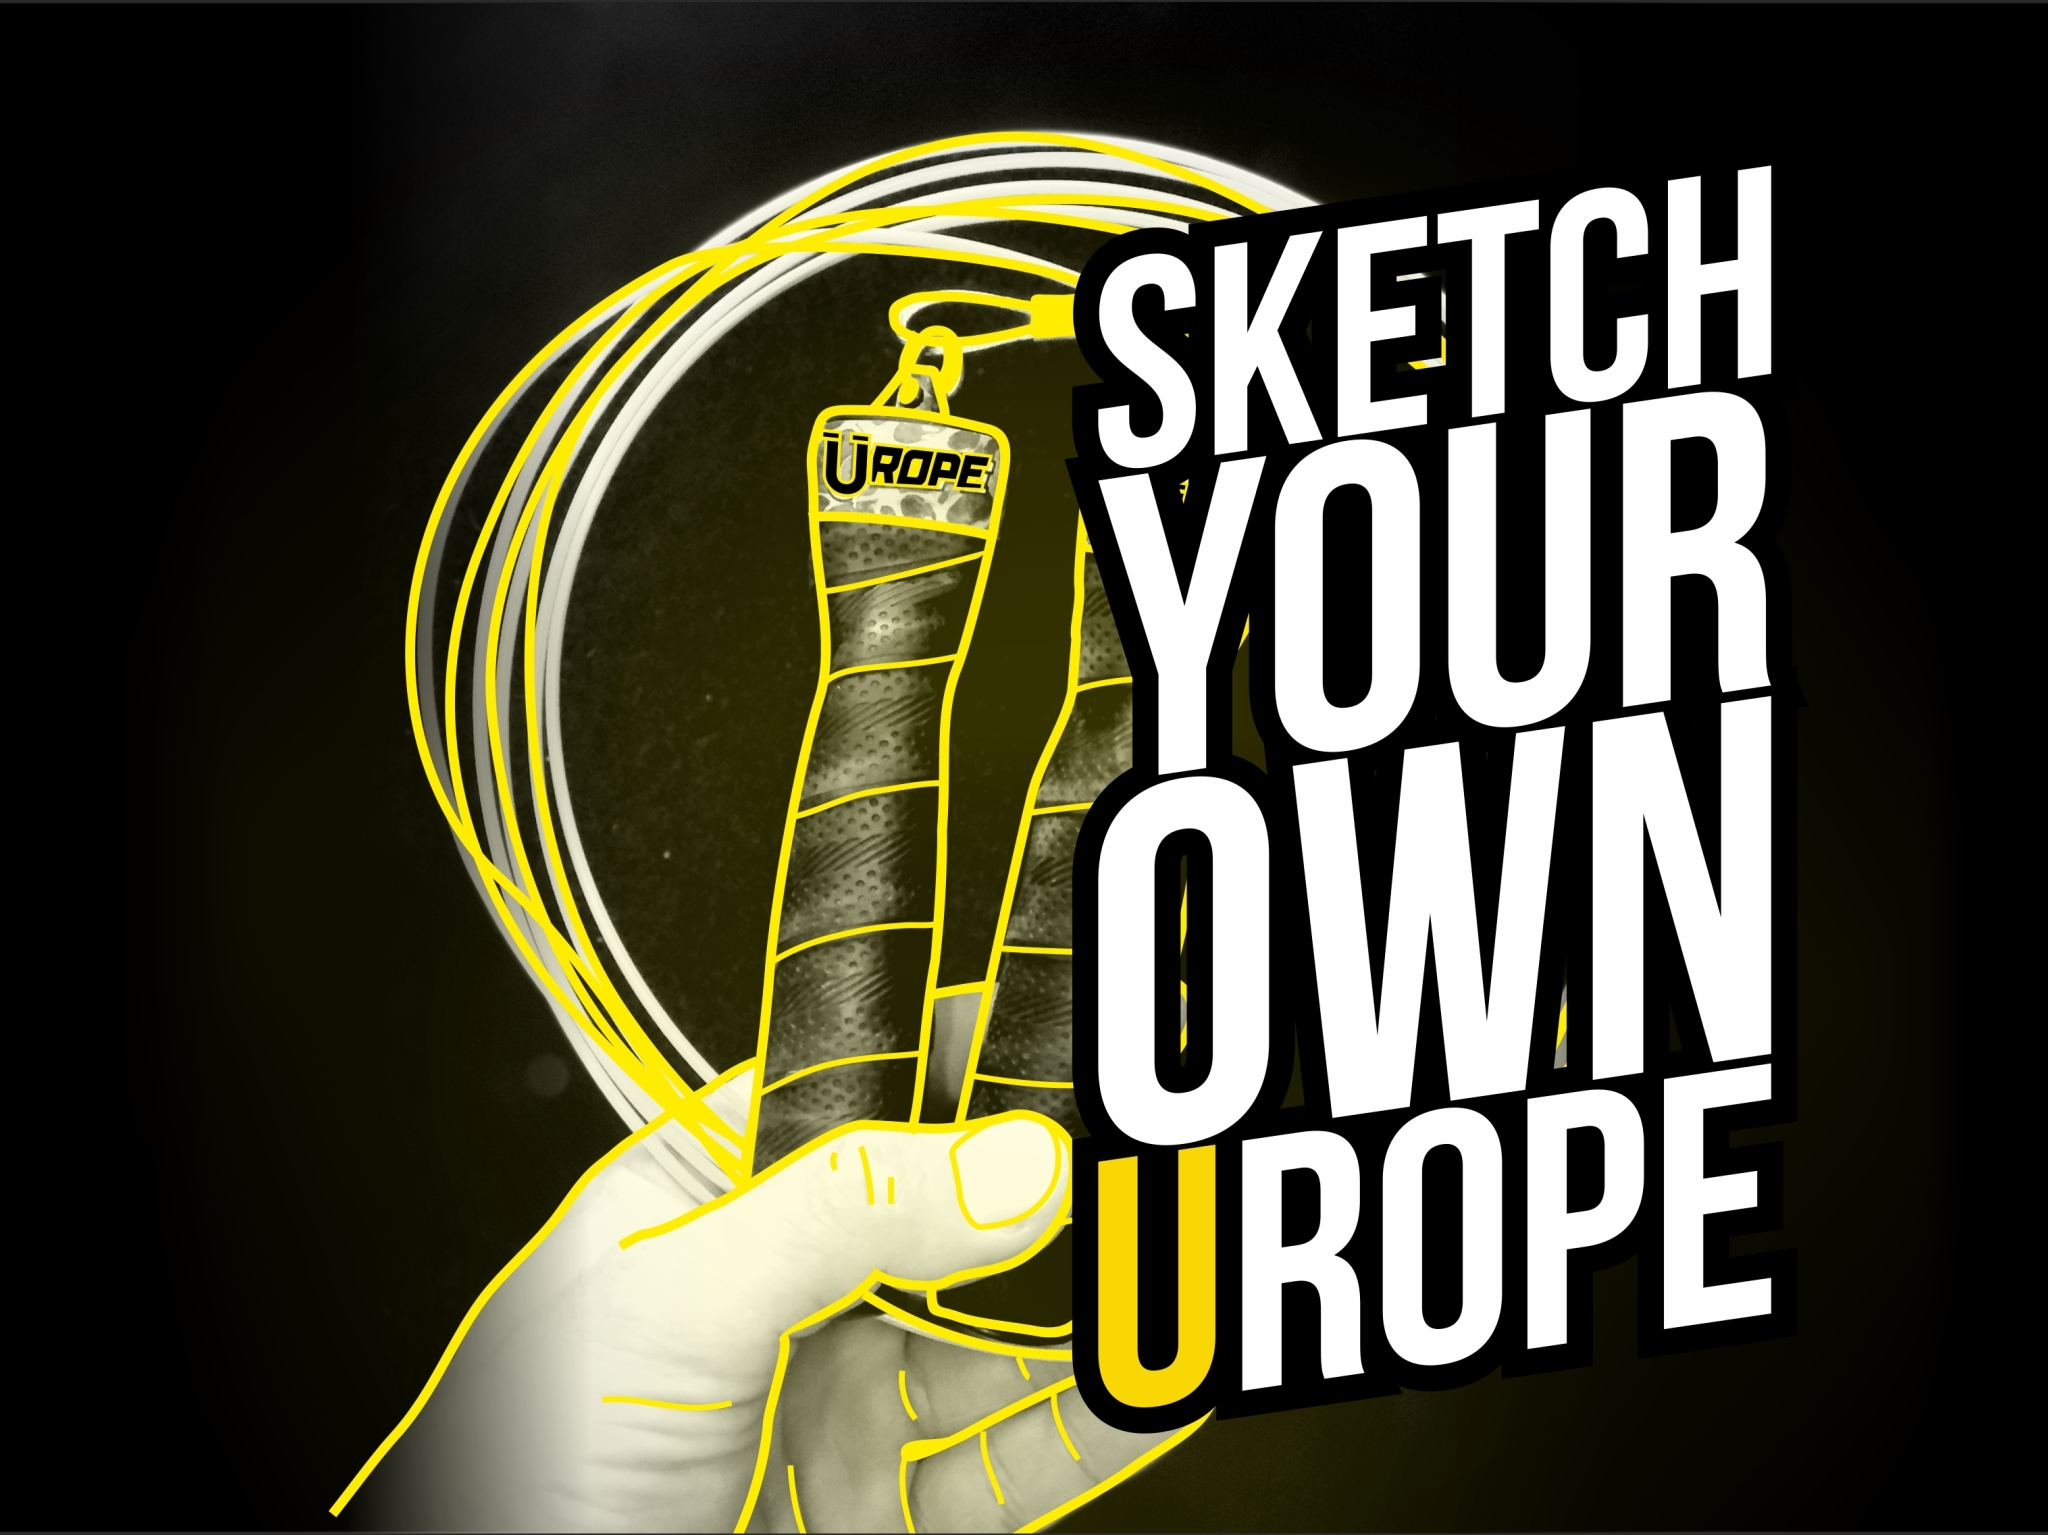 wyn-sketch-urope-banner-mobile